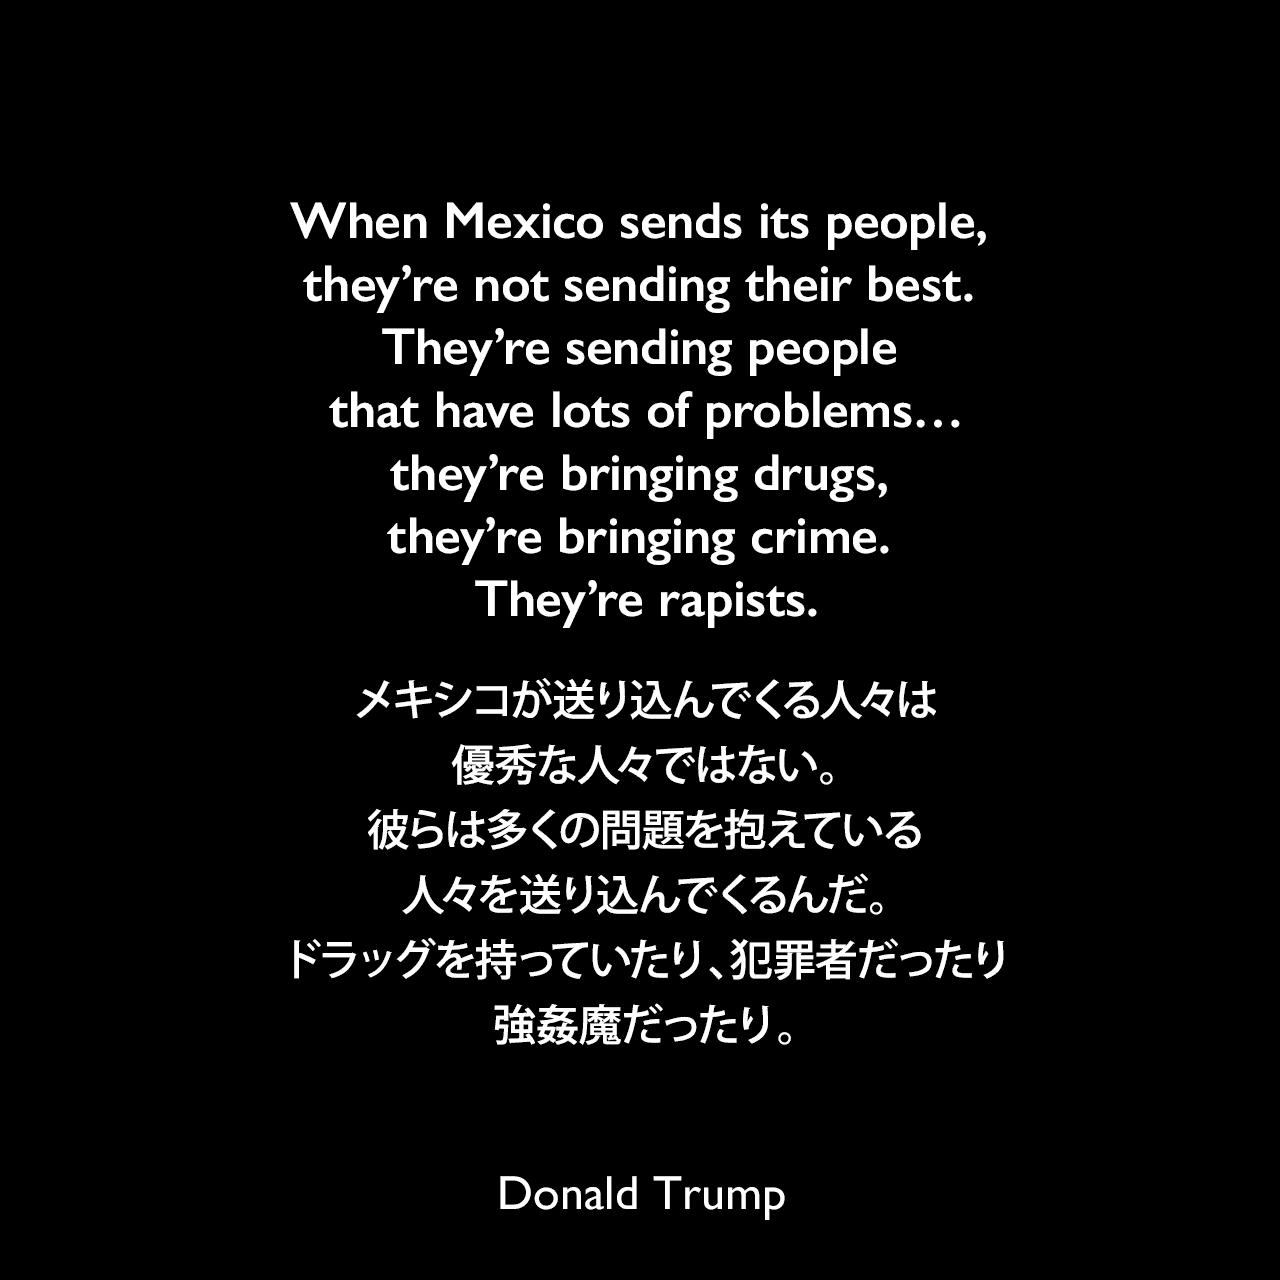 When Mexico sends its people, they're not sending their best. They're sending people that have lots of problems…they're bringing drugs, they're bringing crime. They're rapists.メキシコが送り込んでくる人々は優秀な人々ではない。彼らは多くの問題を抱えている人々を送り込んでくるんだ。ドラッグを持っていたり、犯罪者だったり、強姦魔だったり。- 2015年の大統領選出馬表明スピーチよりDonald Trump